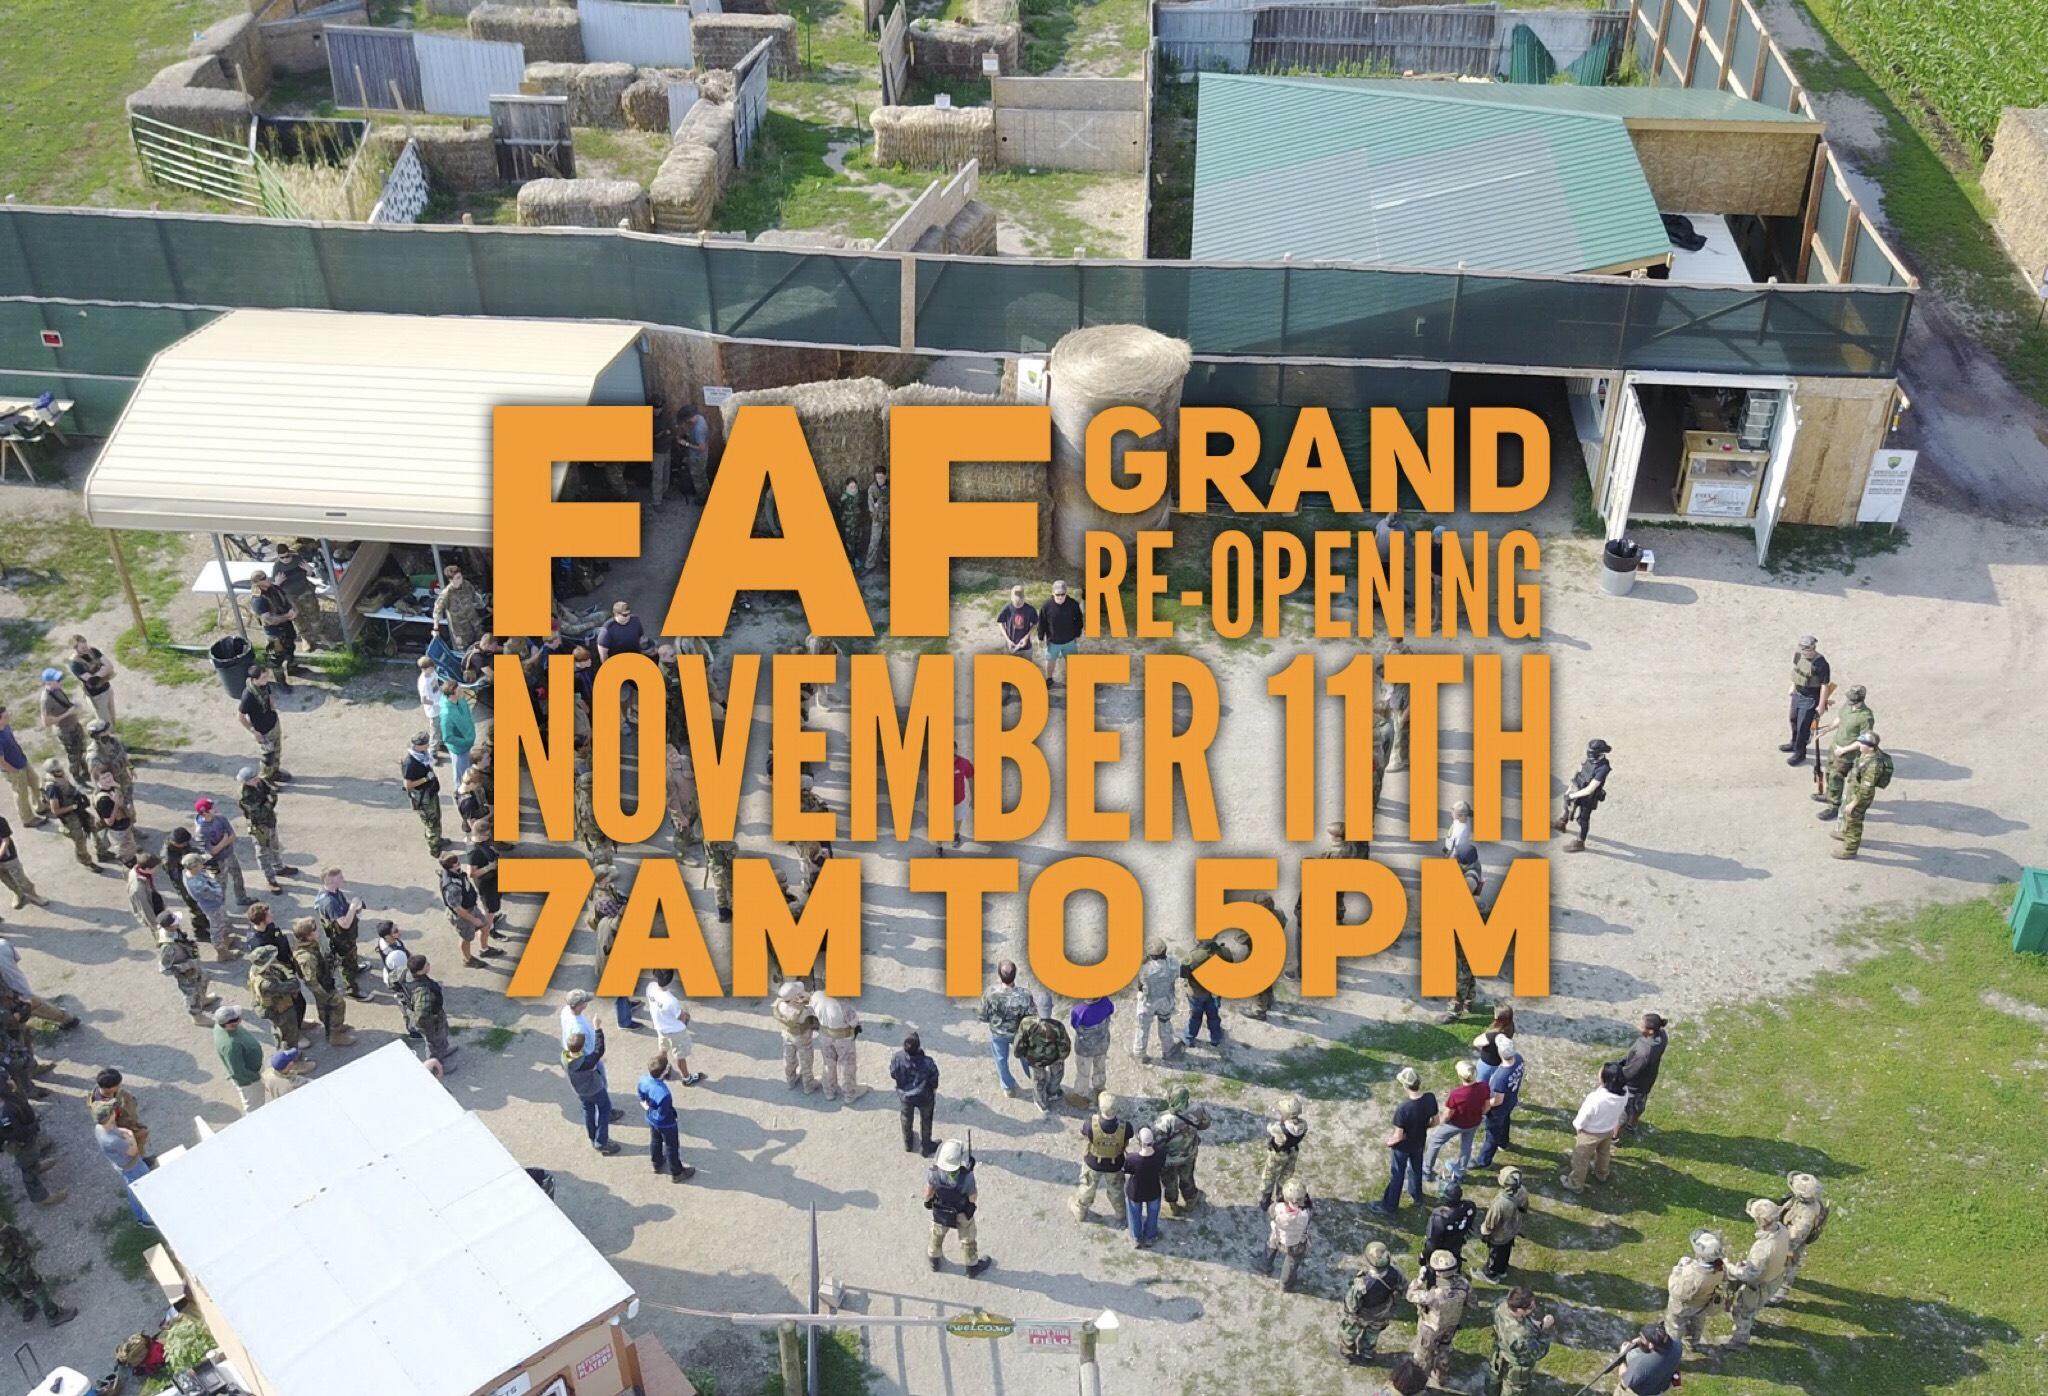 faf-grand-re-opening-8-.jpg